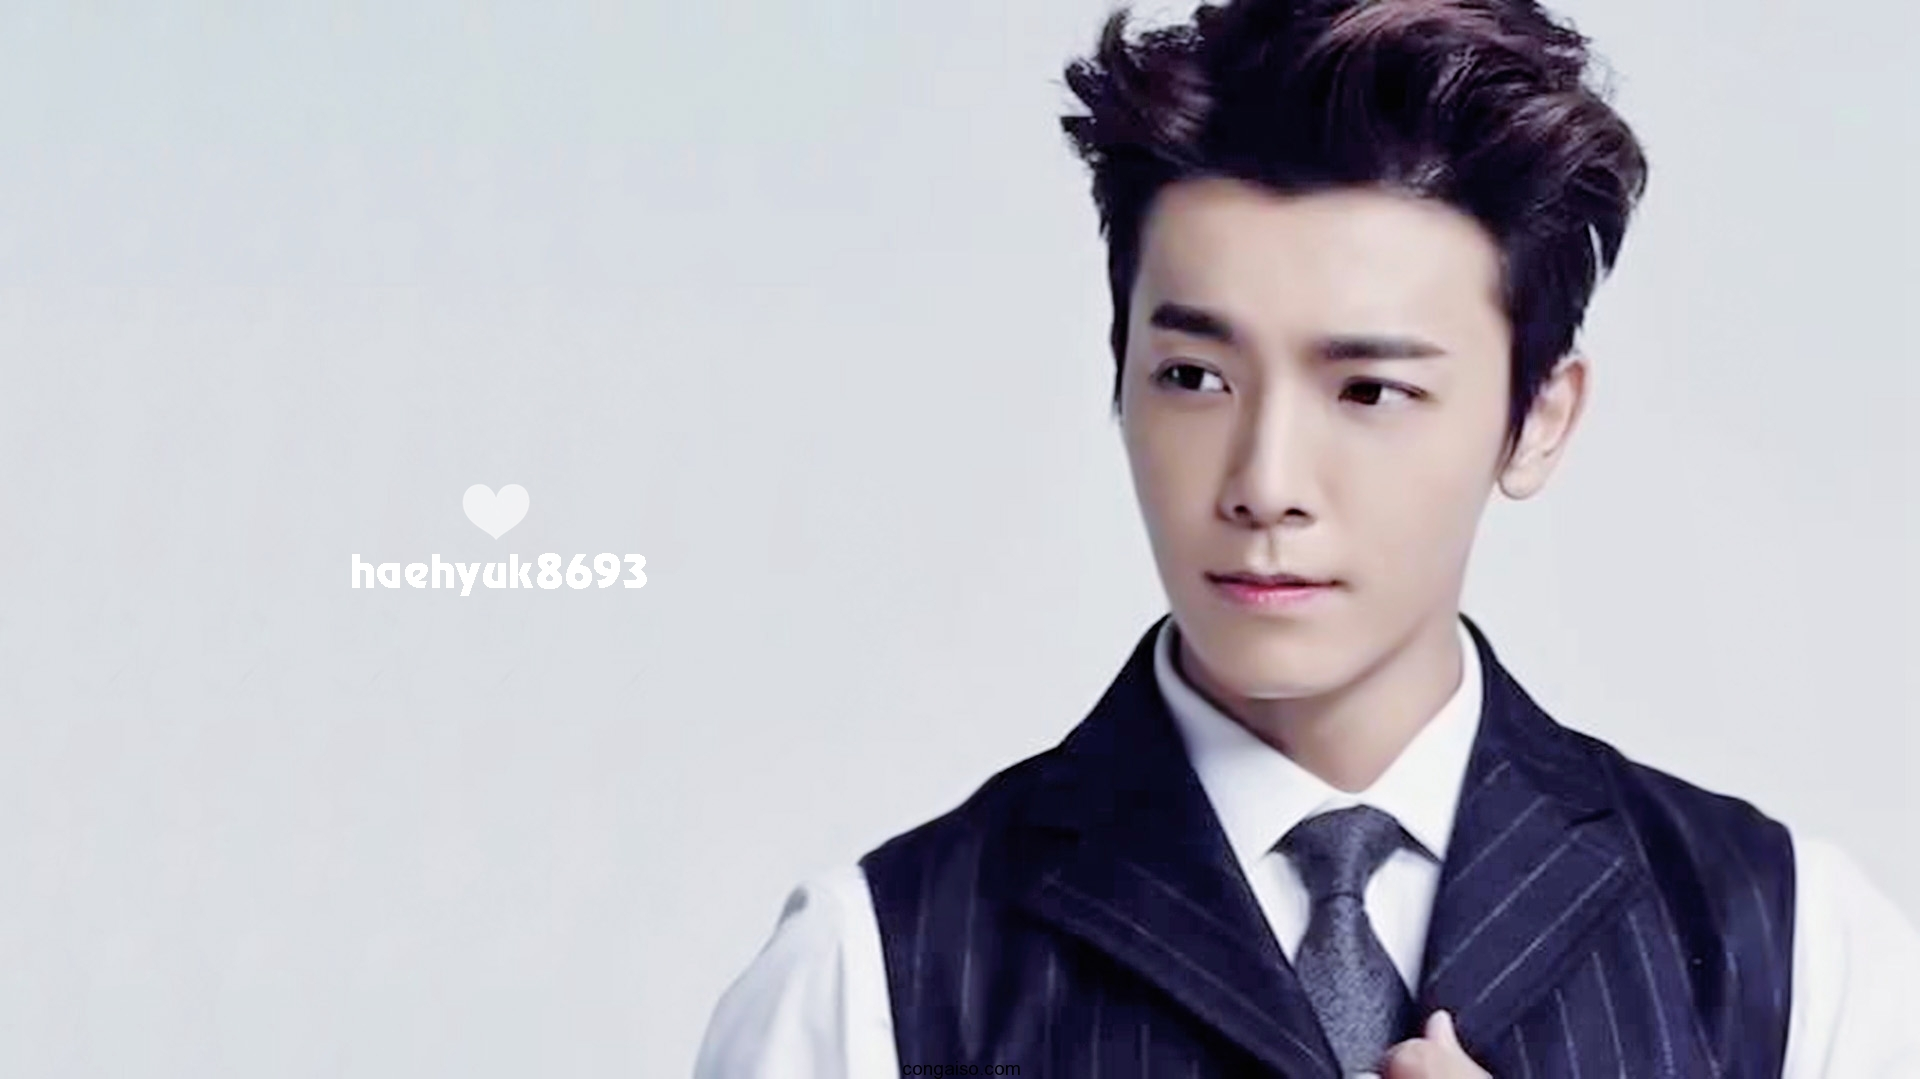 Thong-tin-ve-cac-thanh-vien-trong-nhom-Super-Junior-10